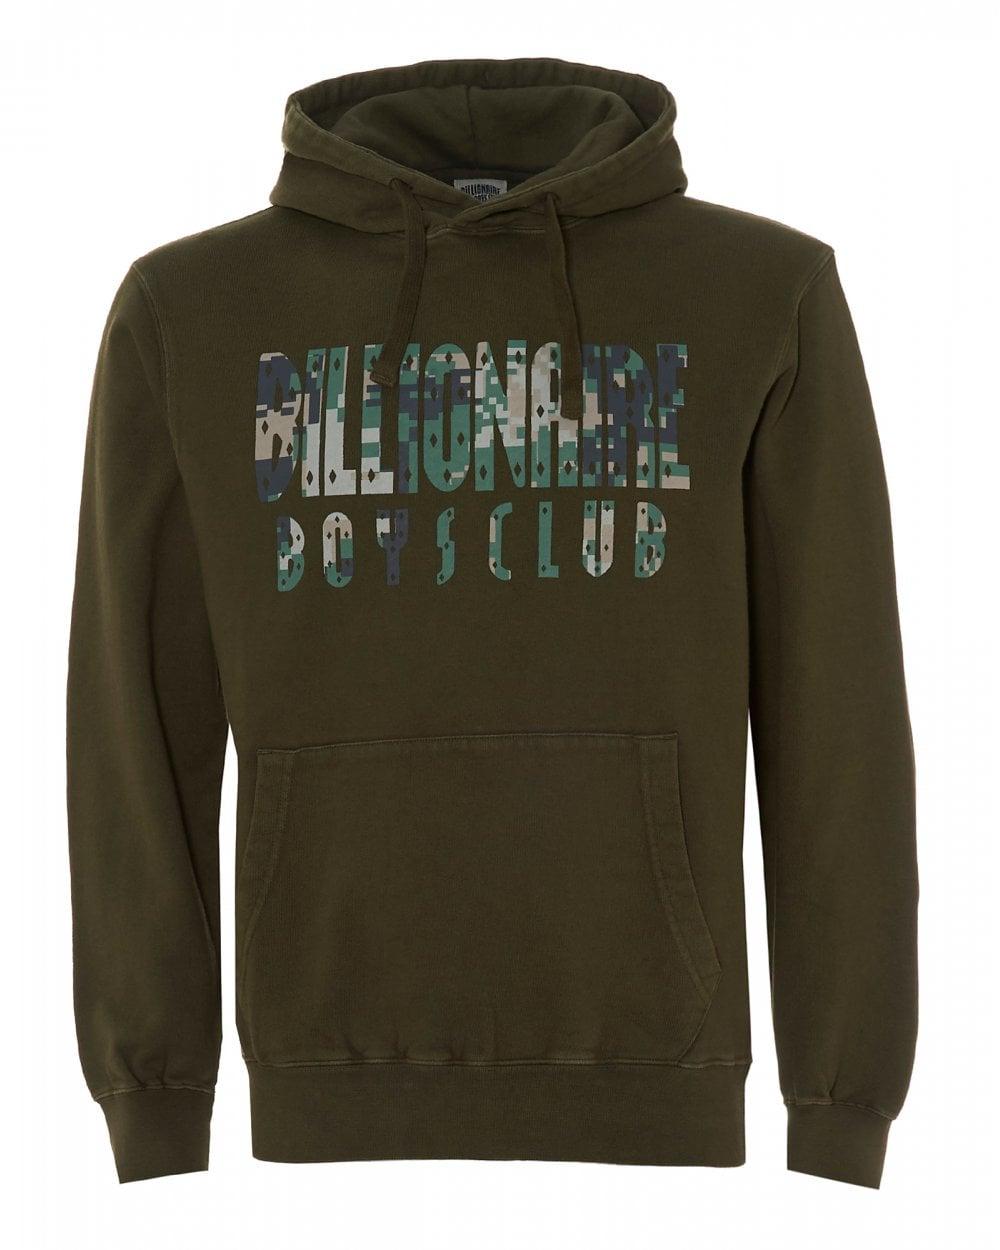 c400c3483 Billionaire Boys Club Mens Overdye Digi Camo Olive Green Hoodie